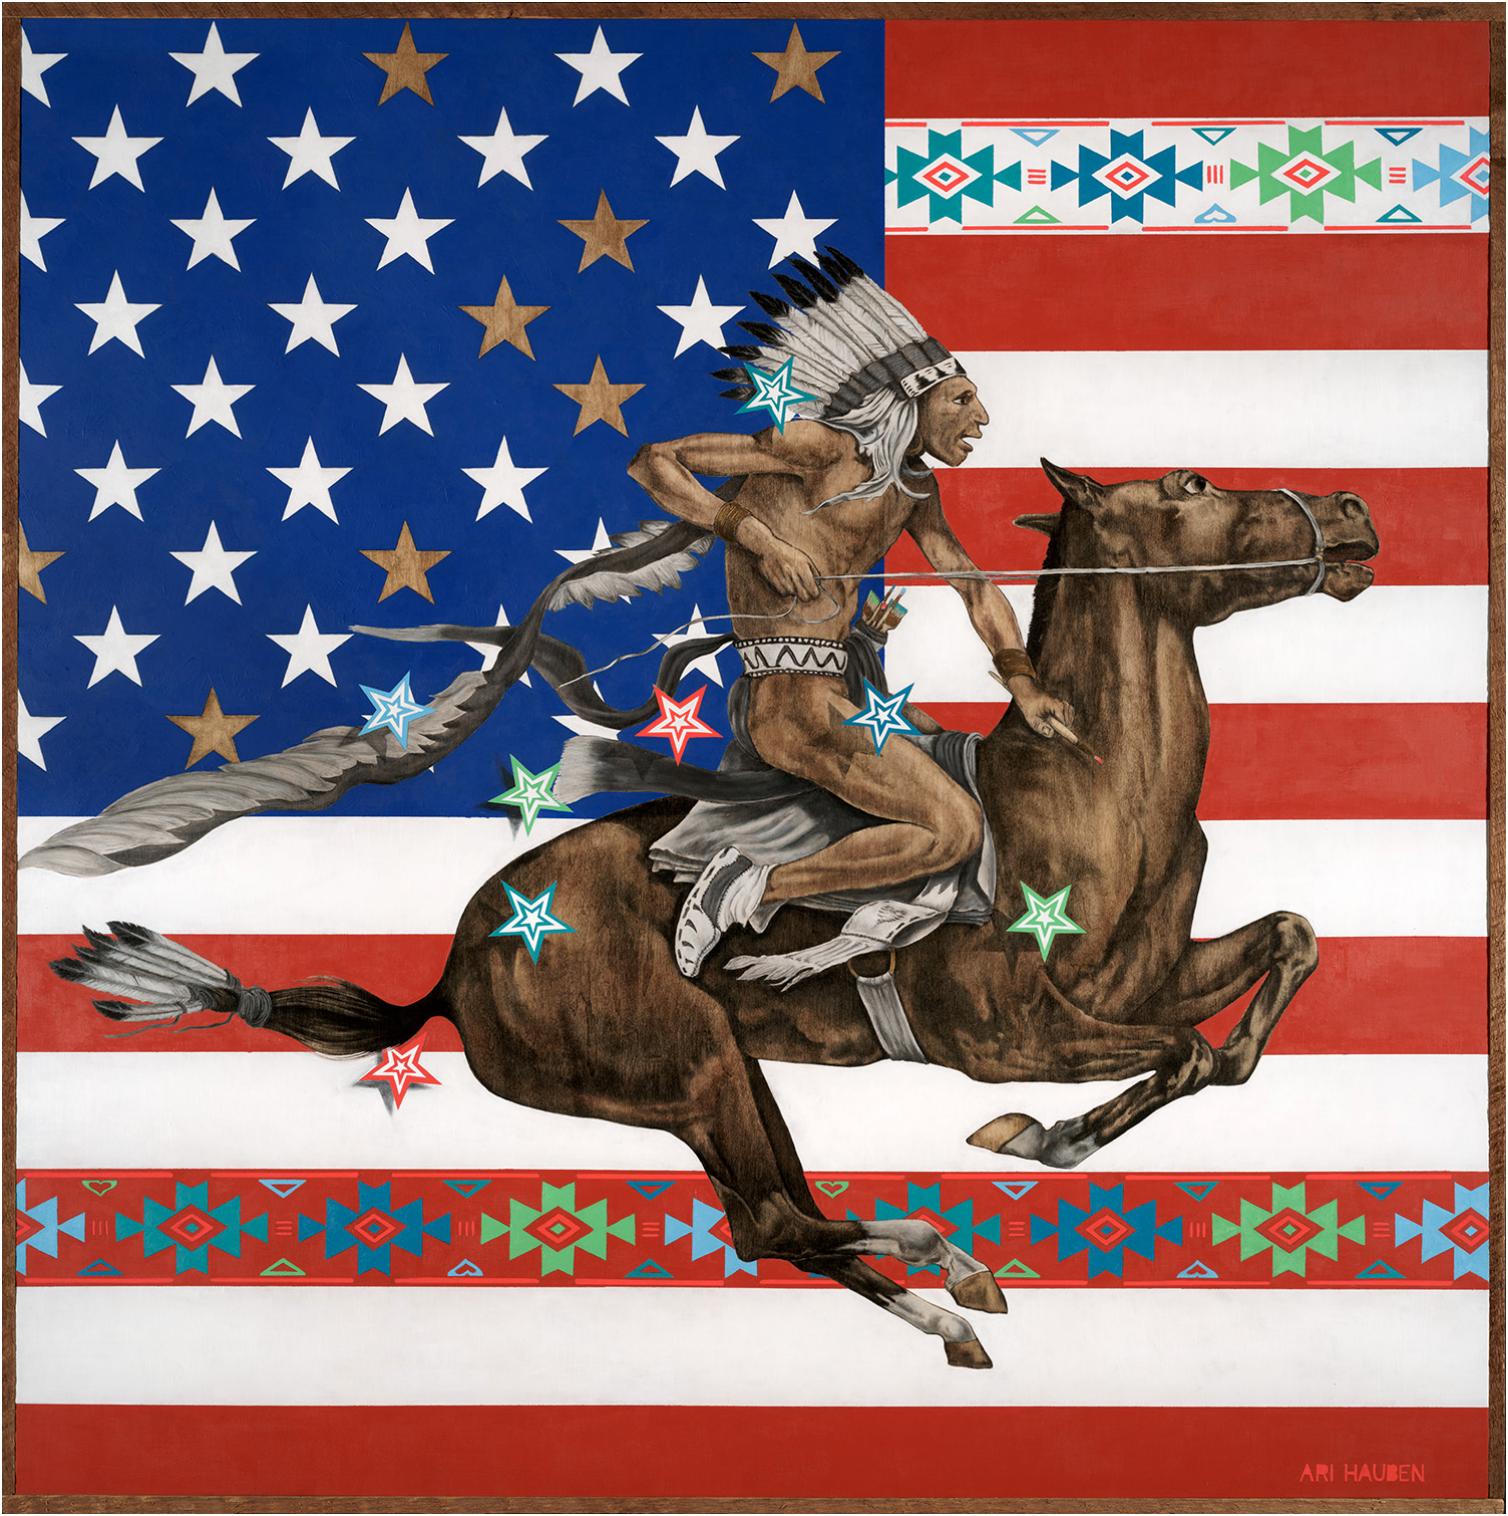 Ari Hauben , Native Color, 44 x 44, oil on wood panel